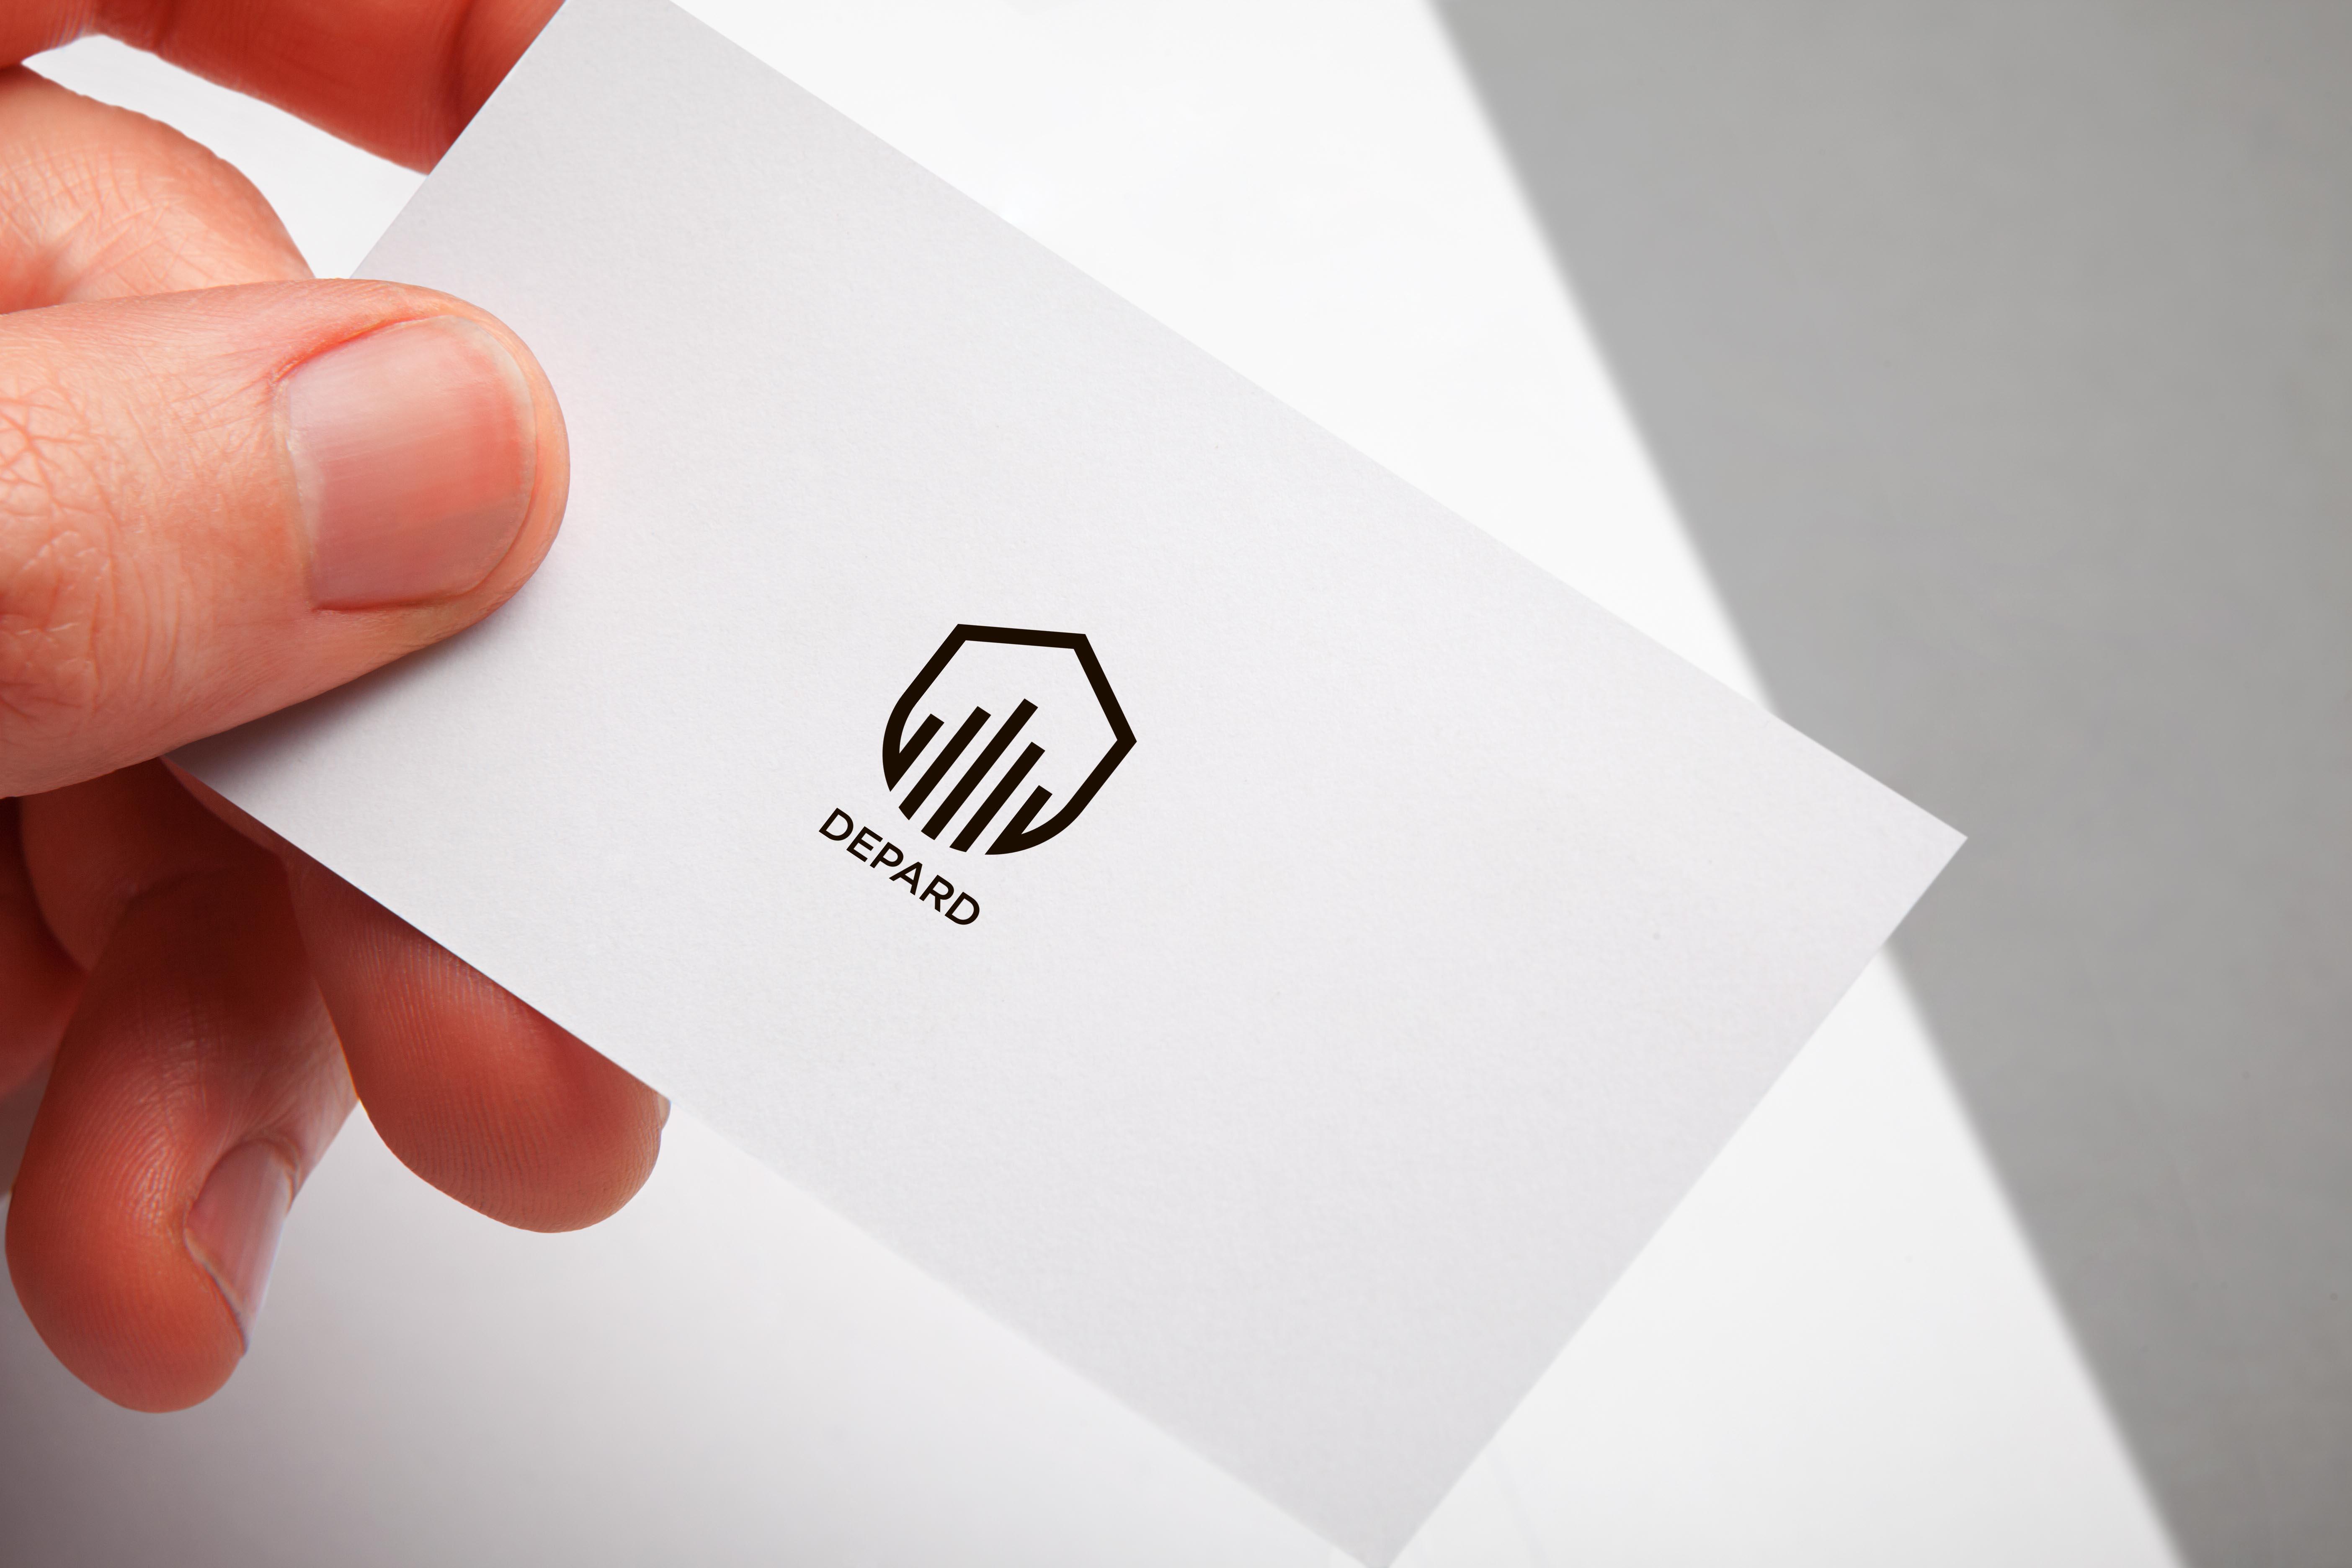 Логотип для компании (услуги недвижимость) фото f_502593561bc12190.jpg